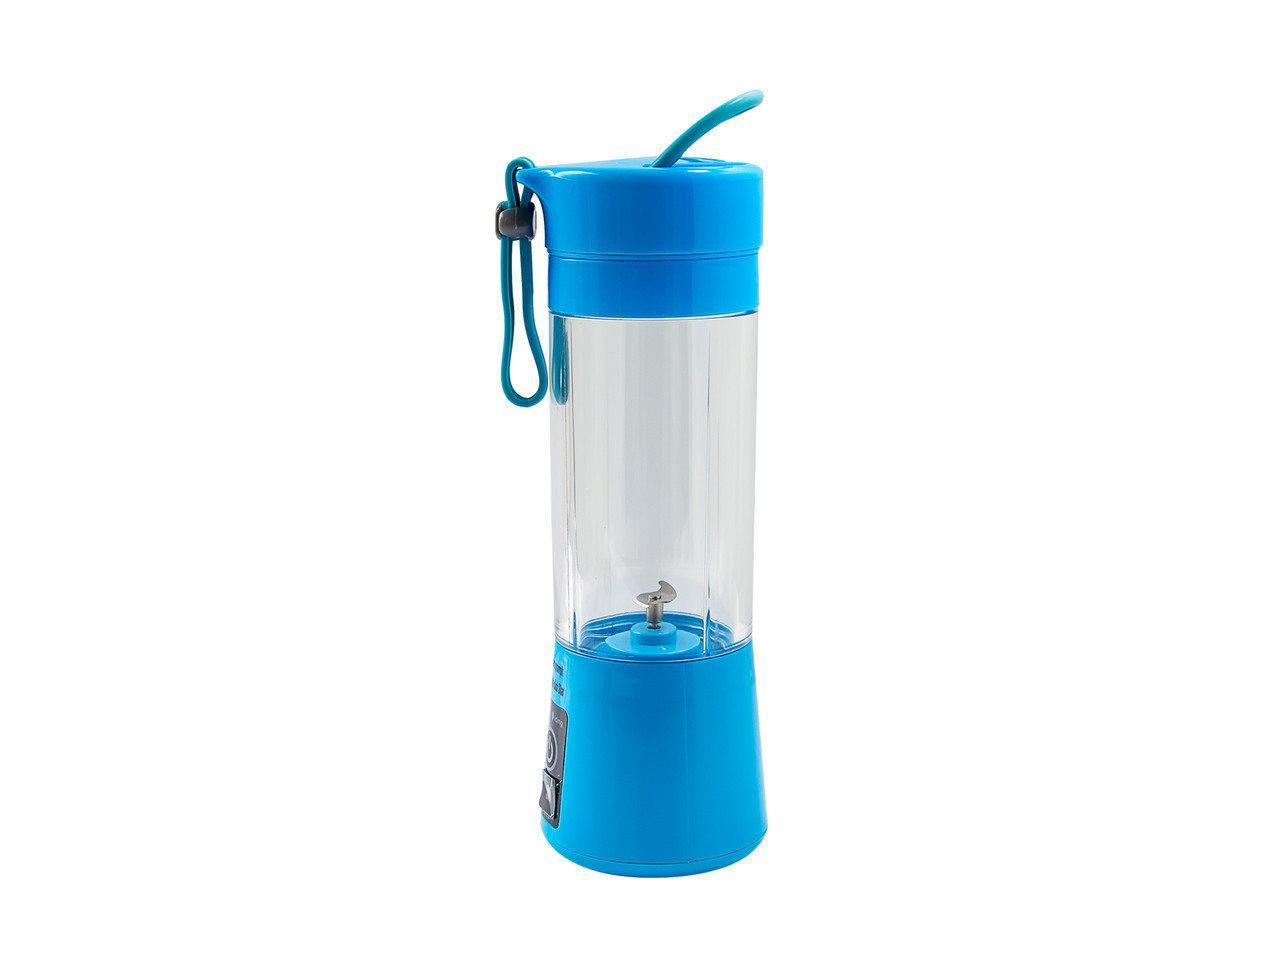 Фитнес блендер Smart Juice синий SKL11-150579